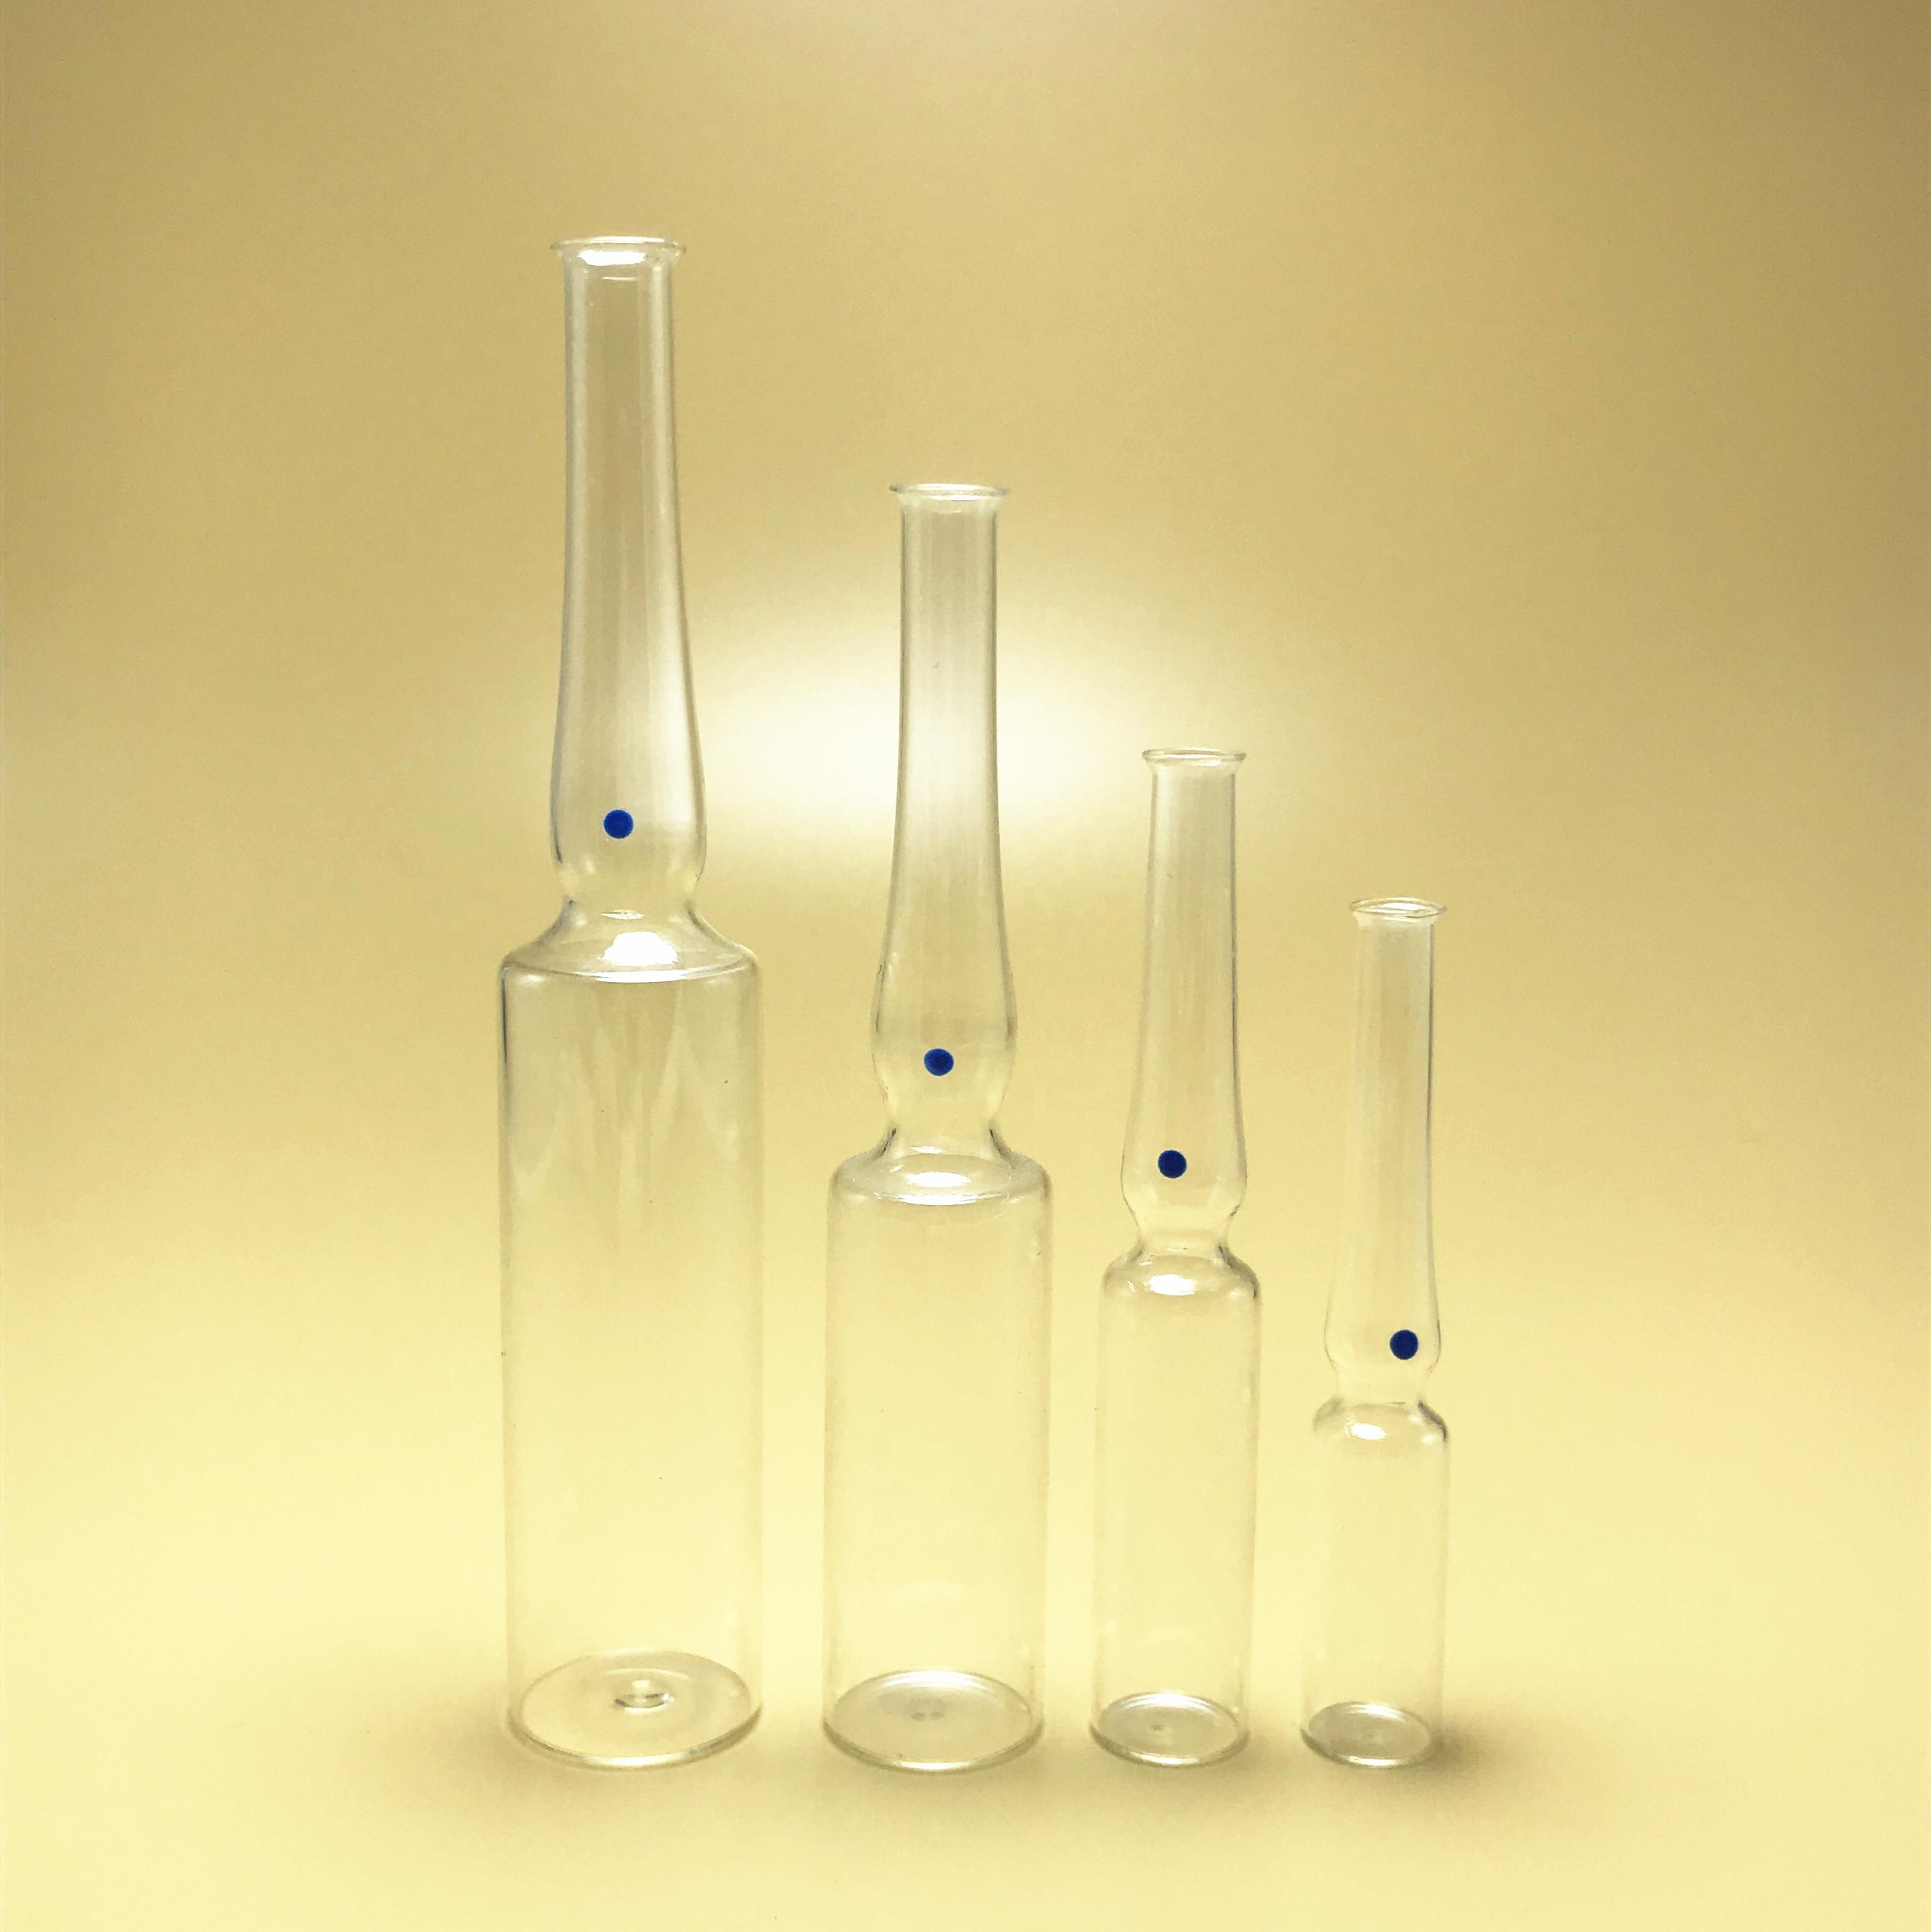 Custom color 1ml 2ml 3ml 5ml 10ml glass Ampoules for injection vials/bottle